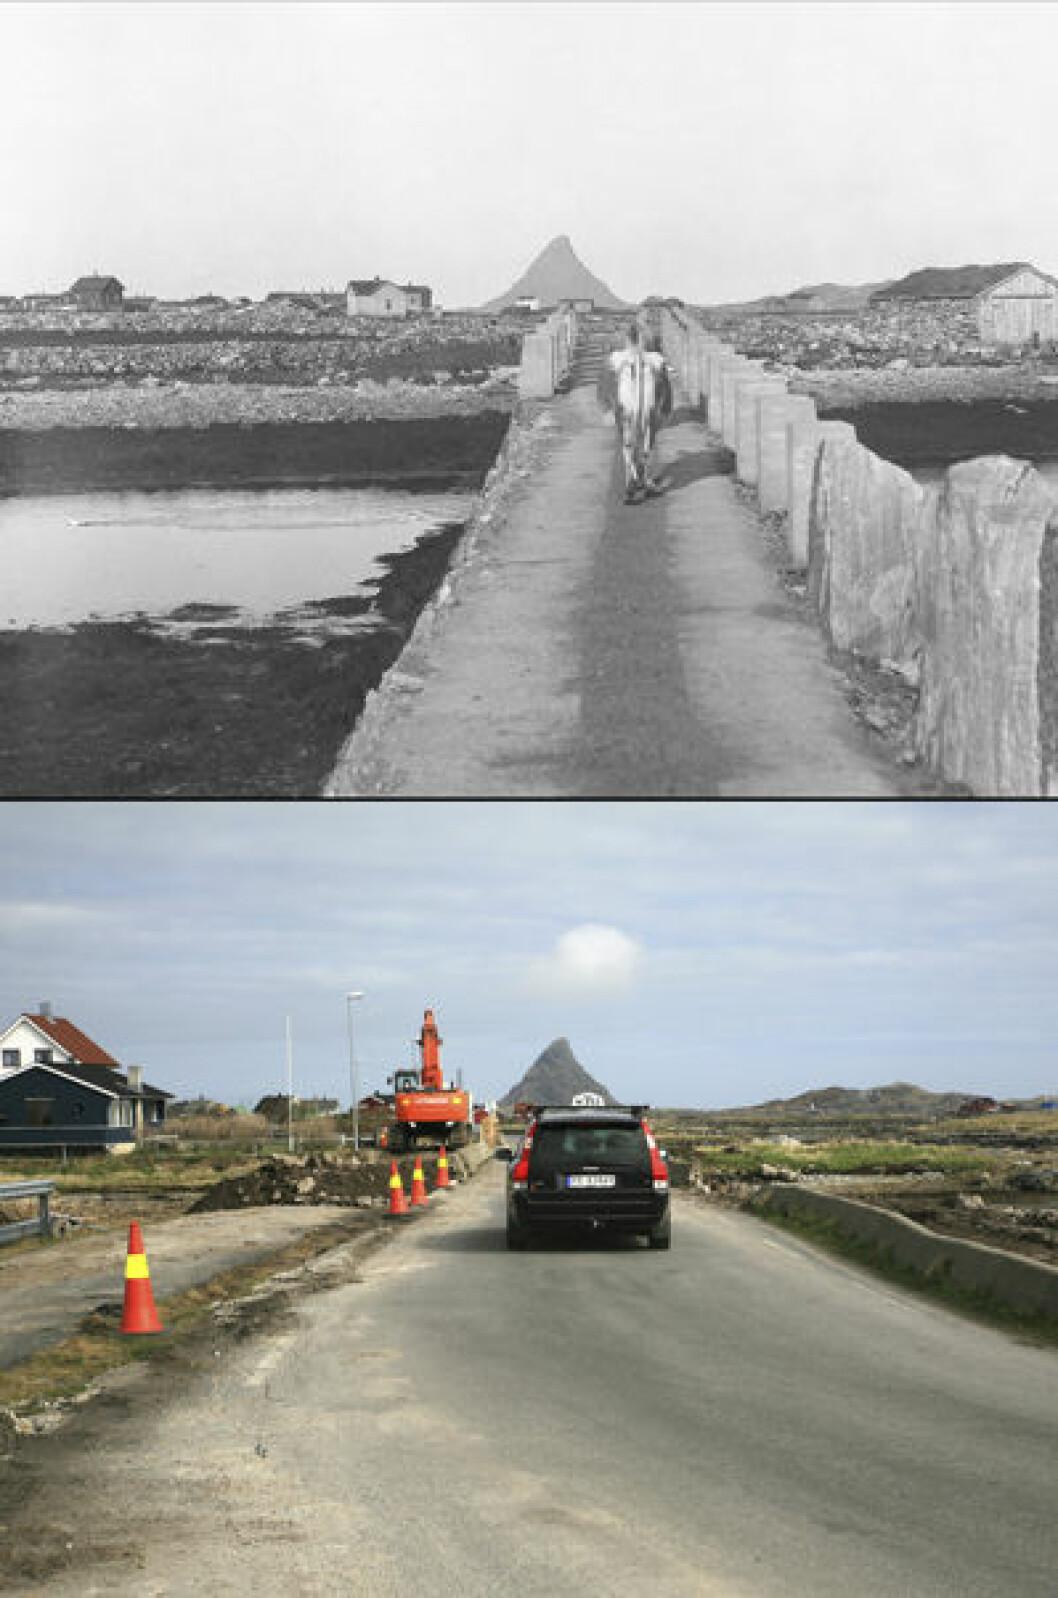 1930 og 2010: Utsikt fra Kalvøya på Røstlandet, Røst i Nordland.Foto: Anders Beer Wilse/Oscar Puschmann